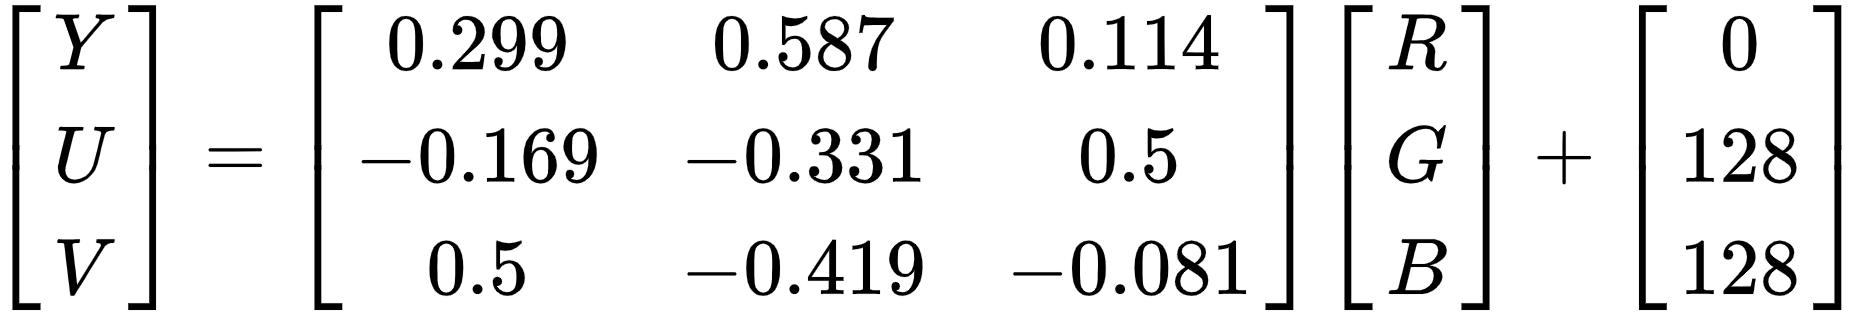 RGB 转 YUV 的转换矩阵